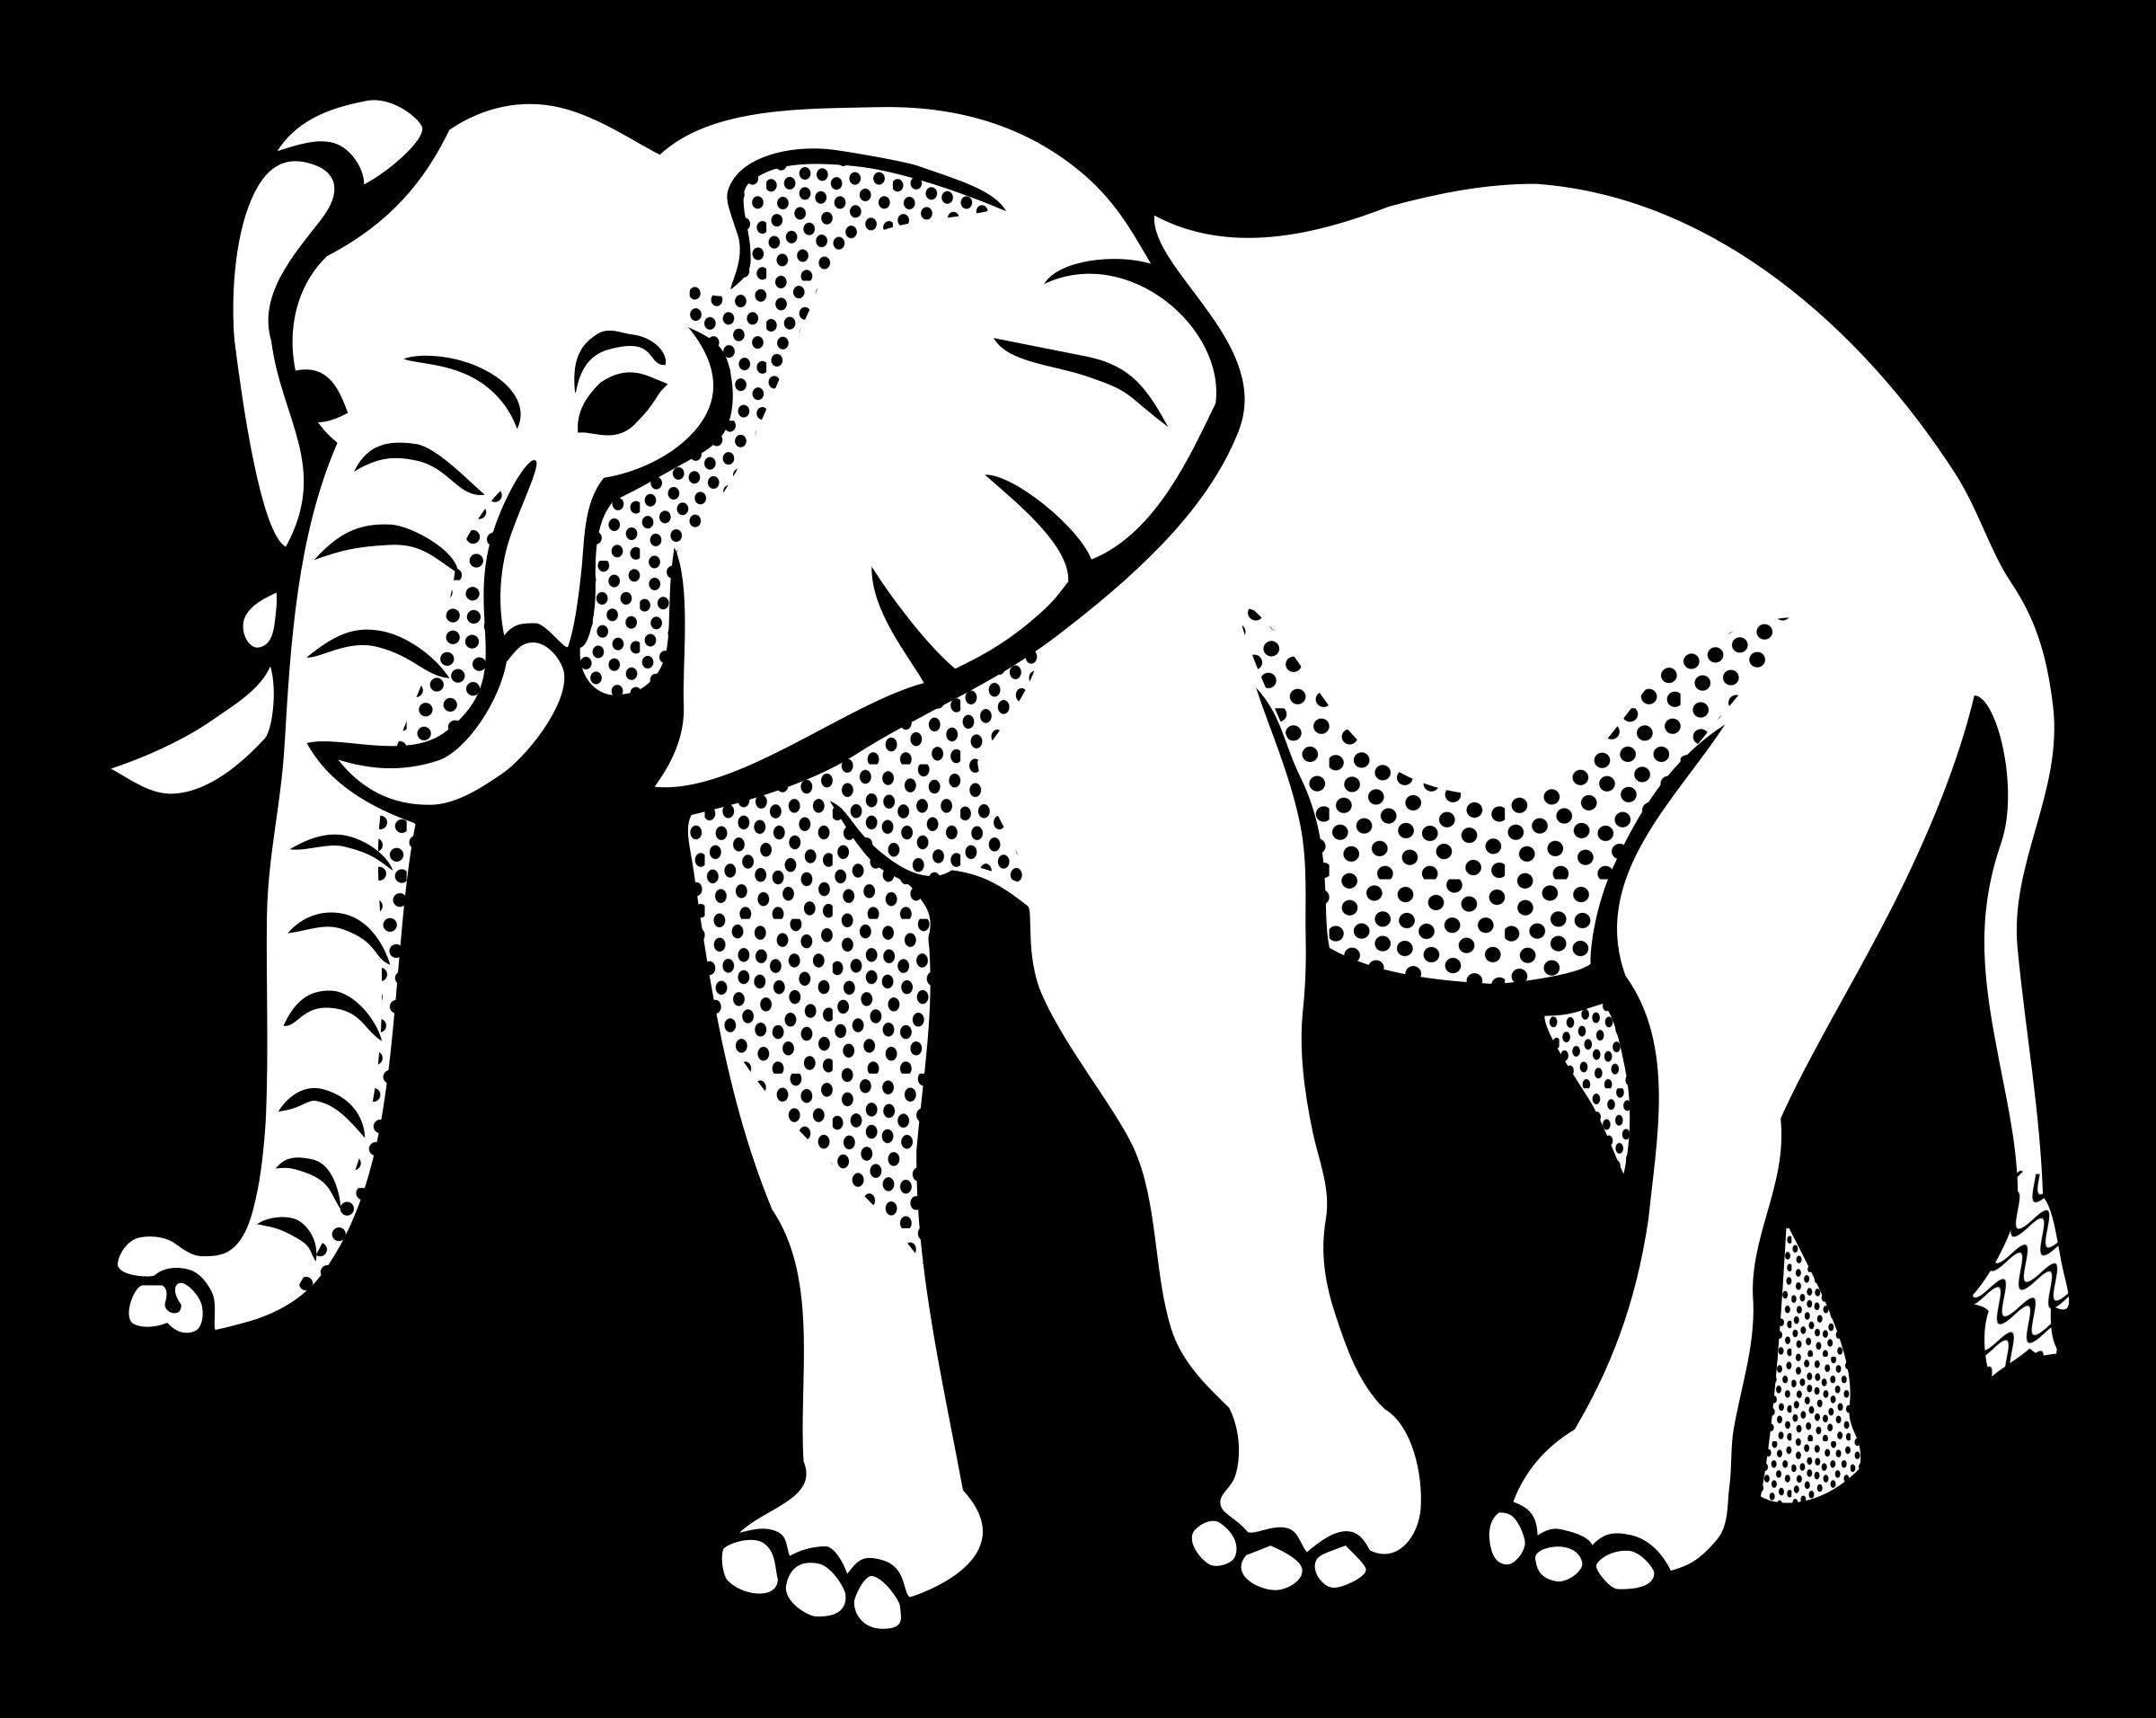 Lineart big image png. Doctors clipart elephant